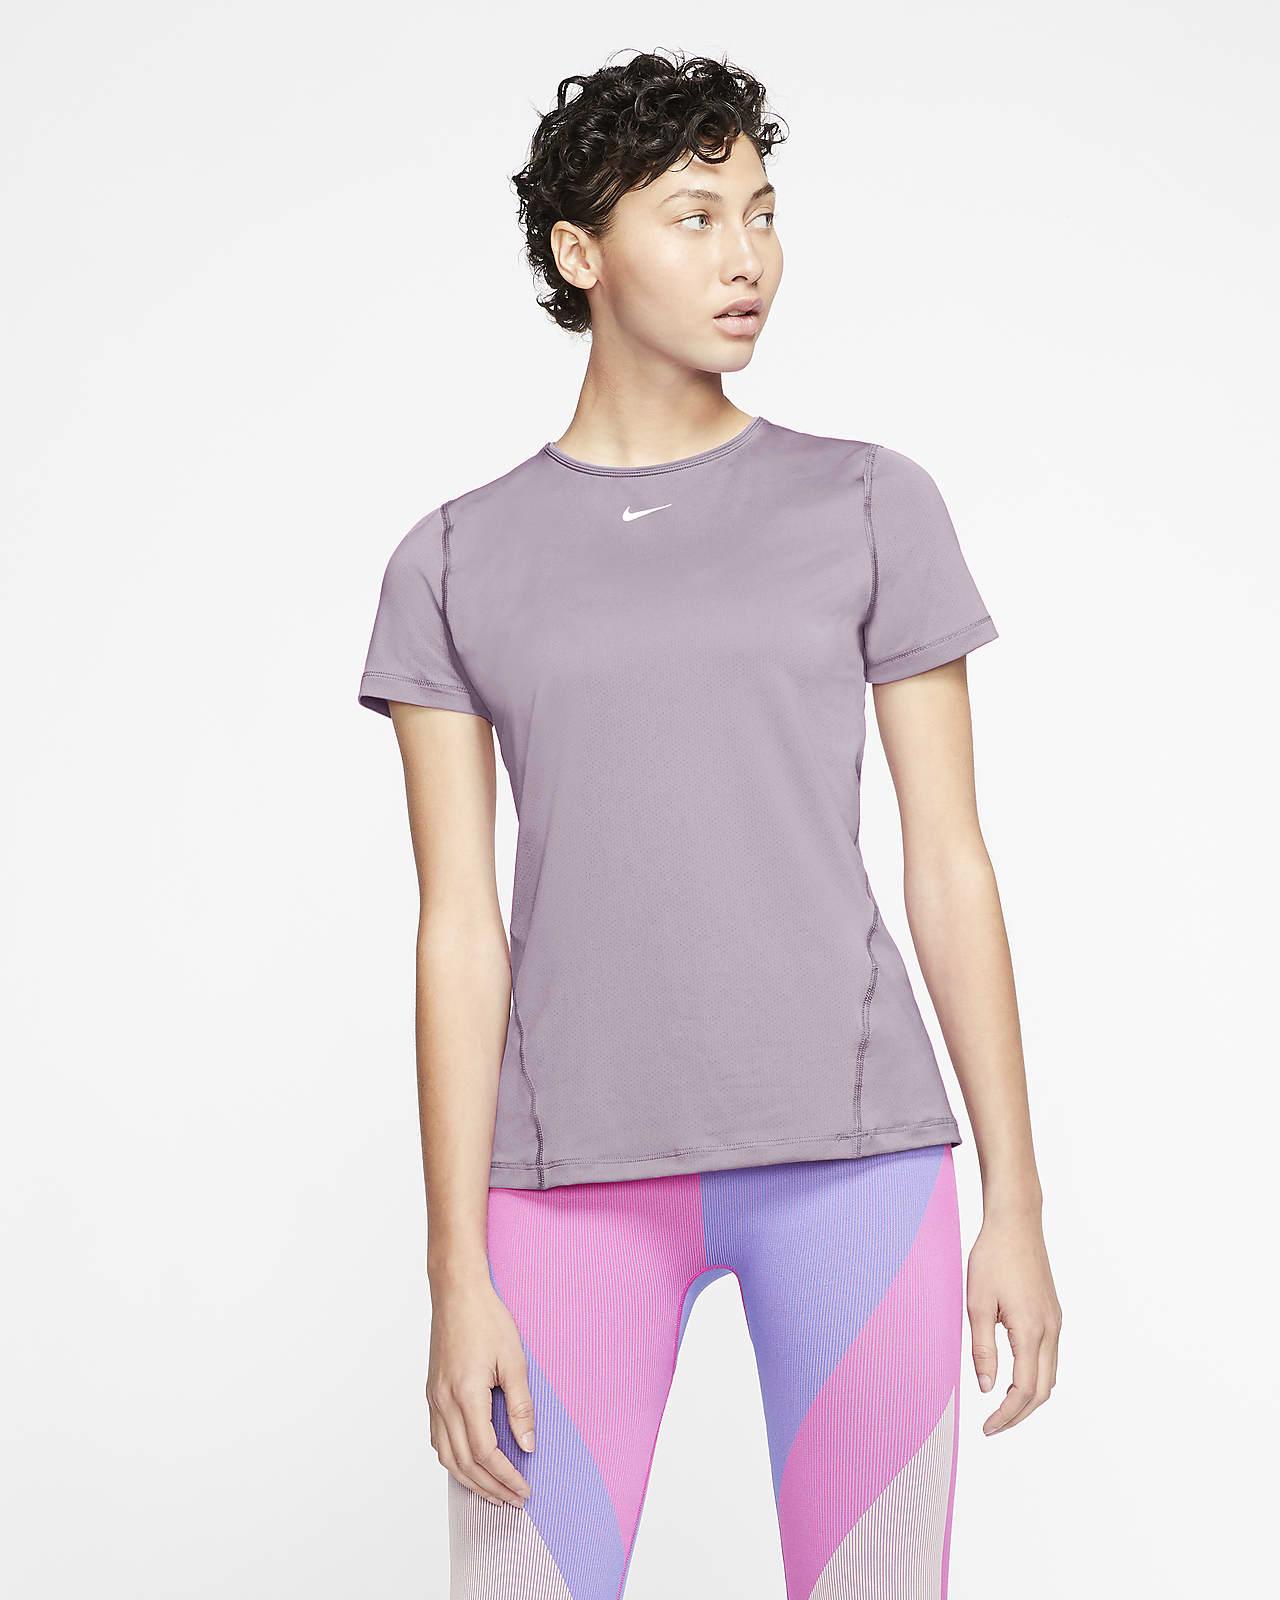 Nike Pro Women's Short-Sleeve Training Top